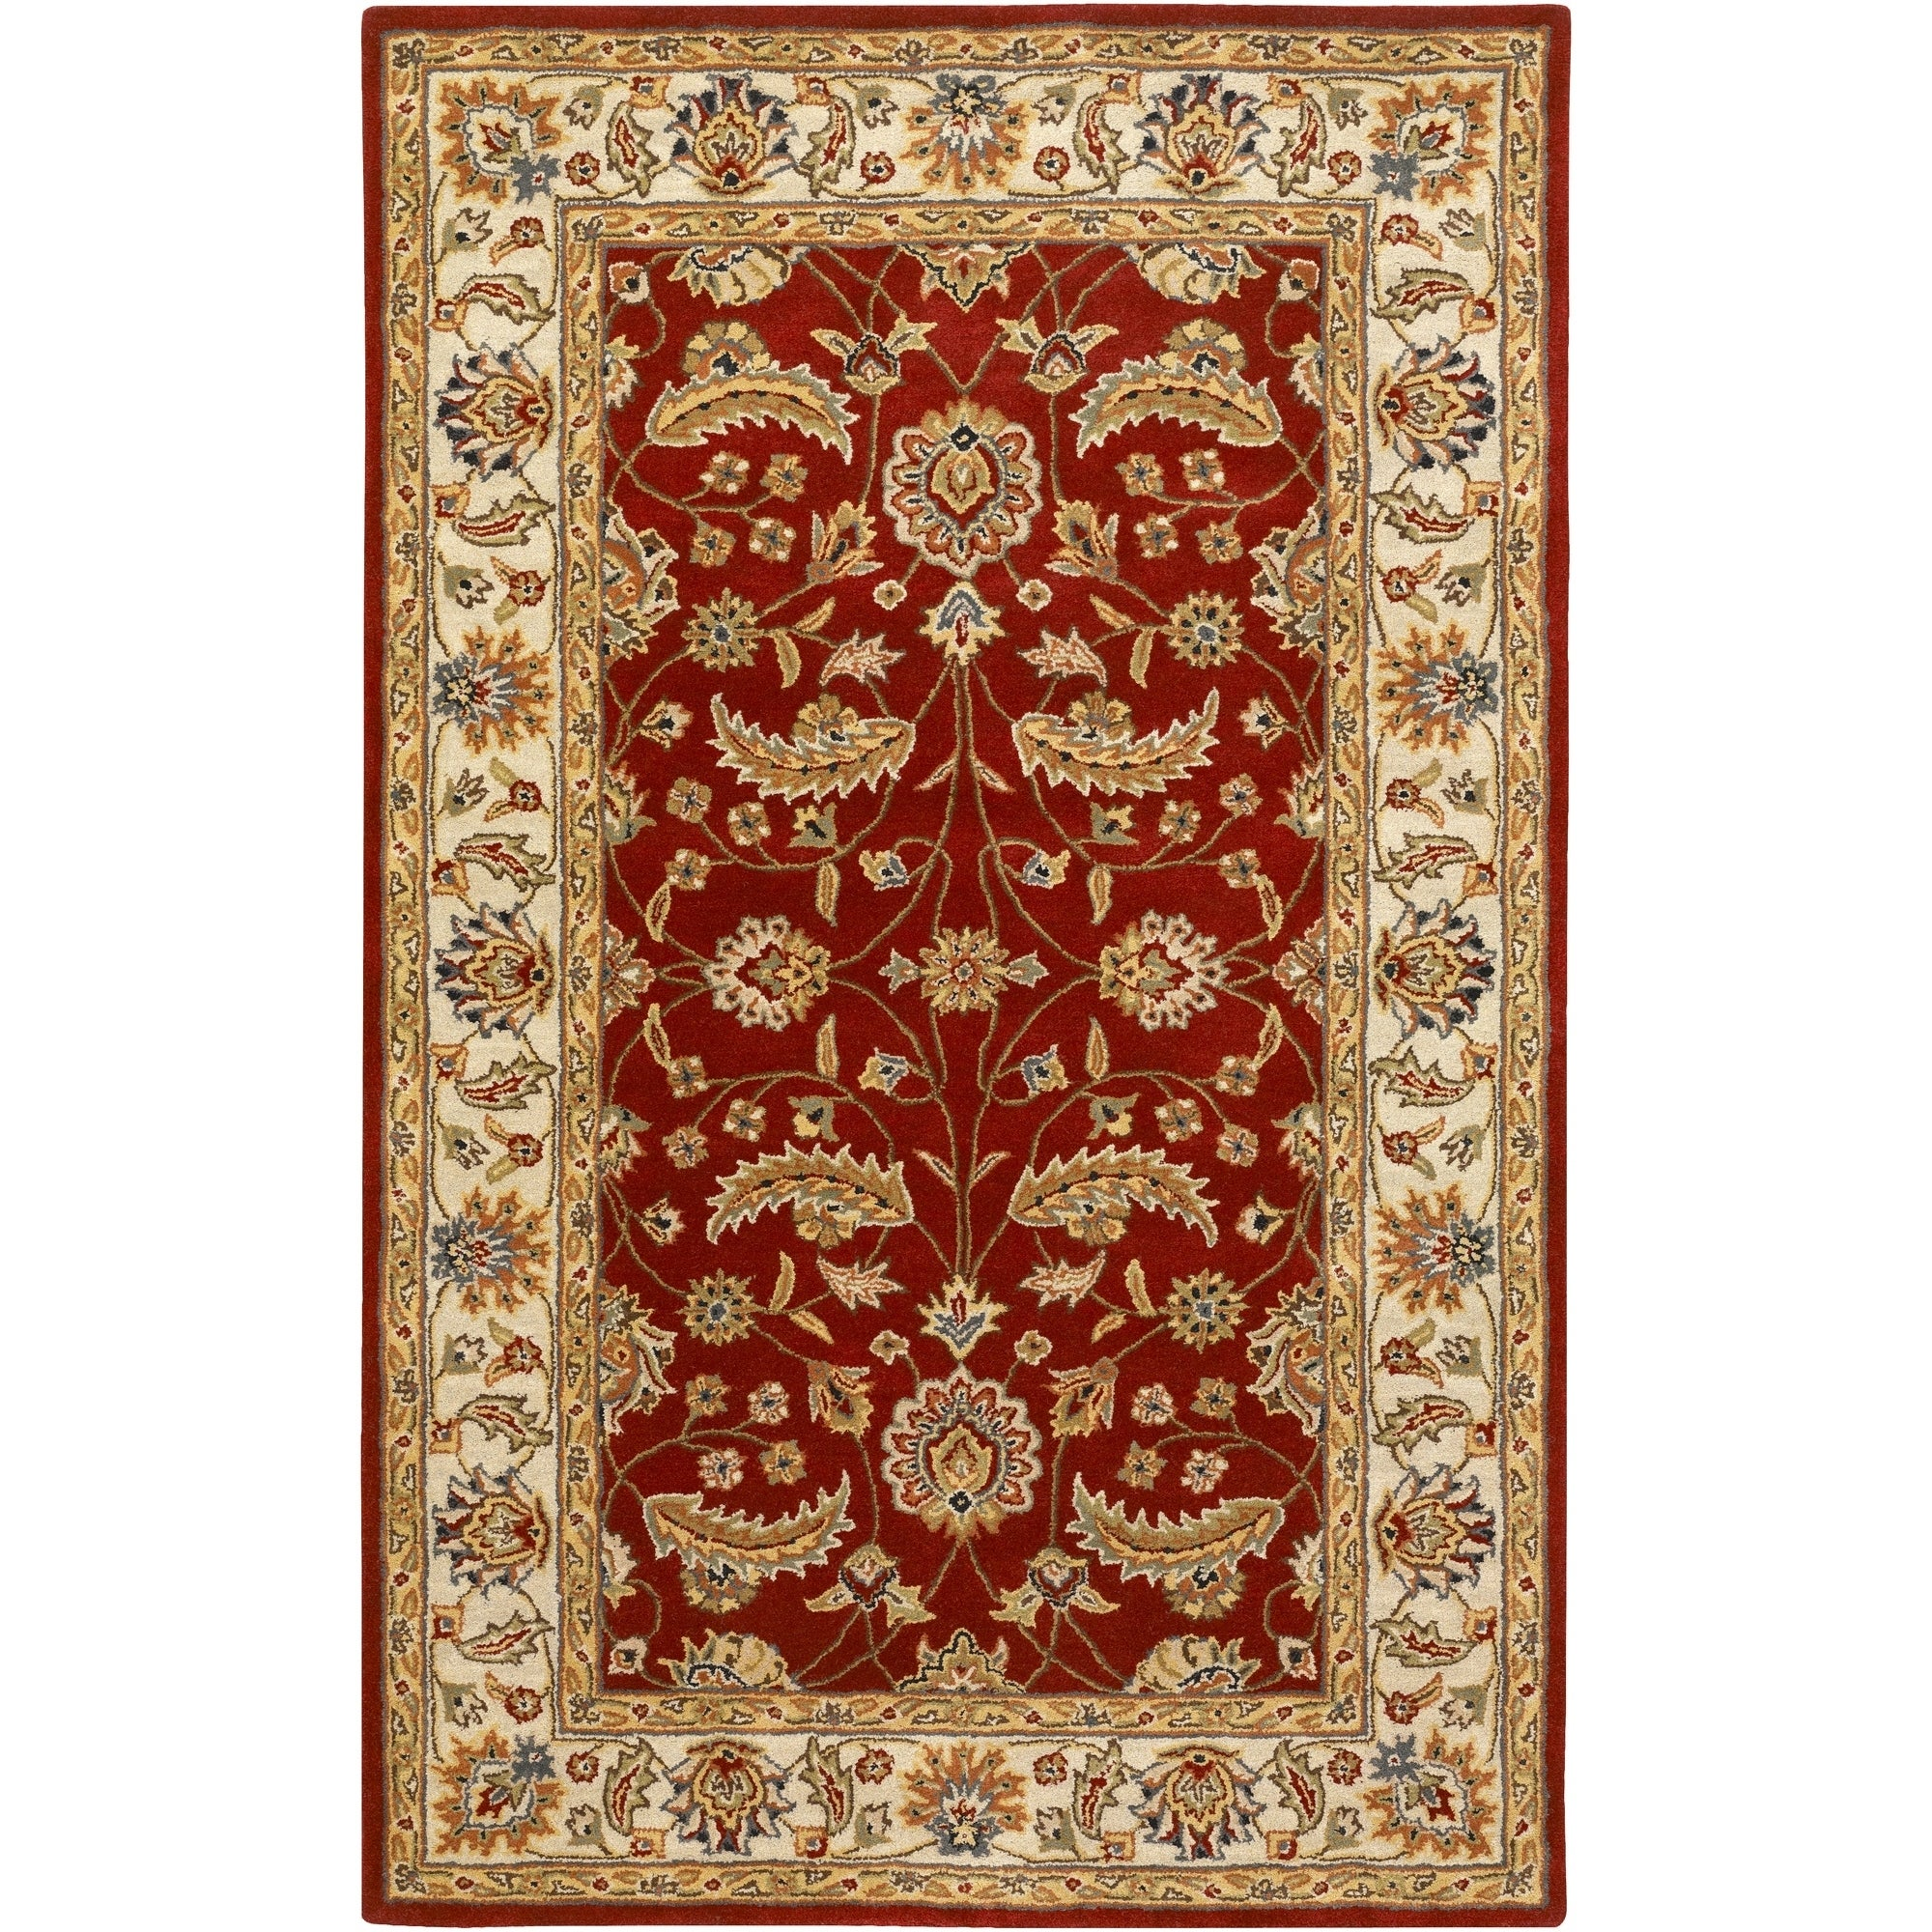 Hand Tufted Kaiser Burgundy Wool Area Rug 4 X 6 On Sale Overstock 5885396